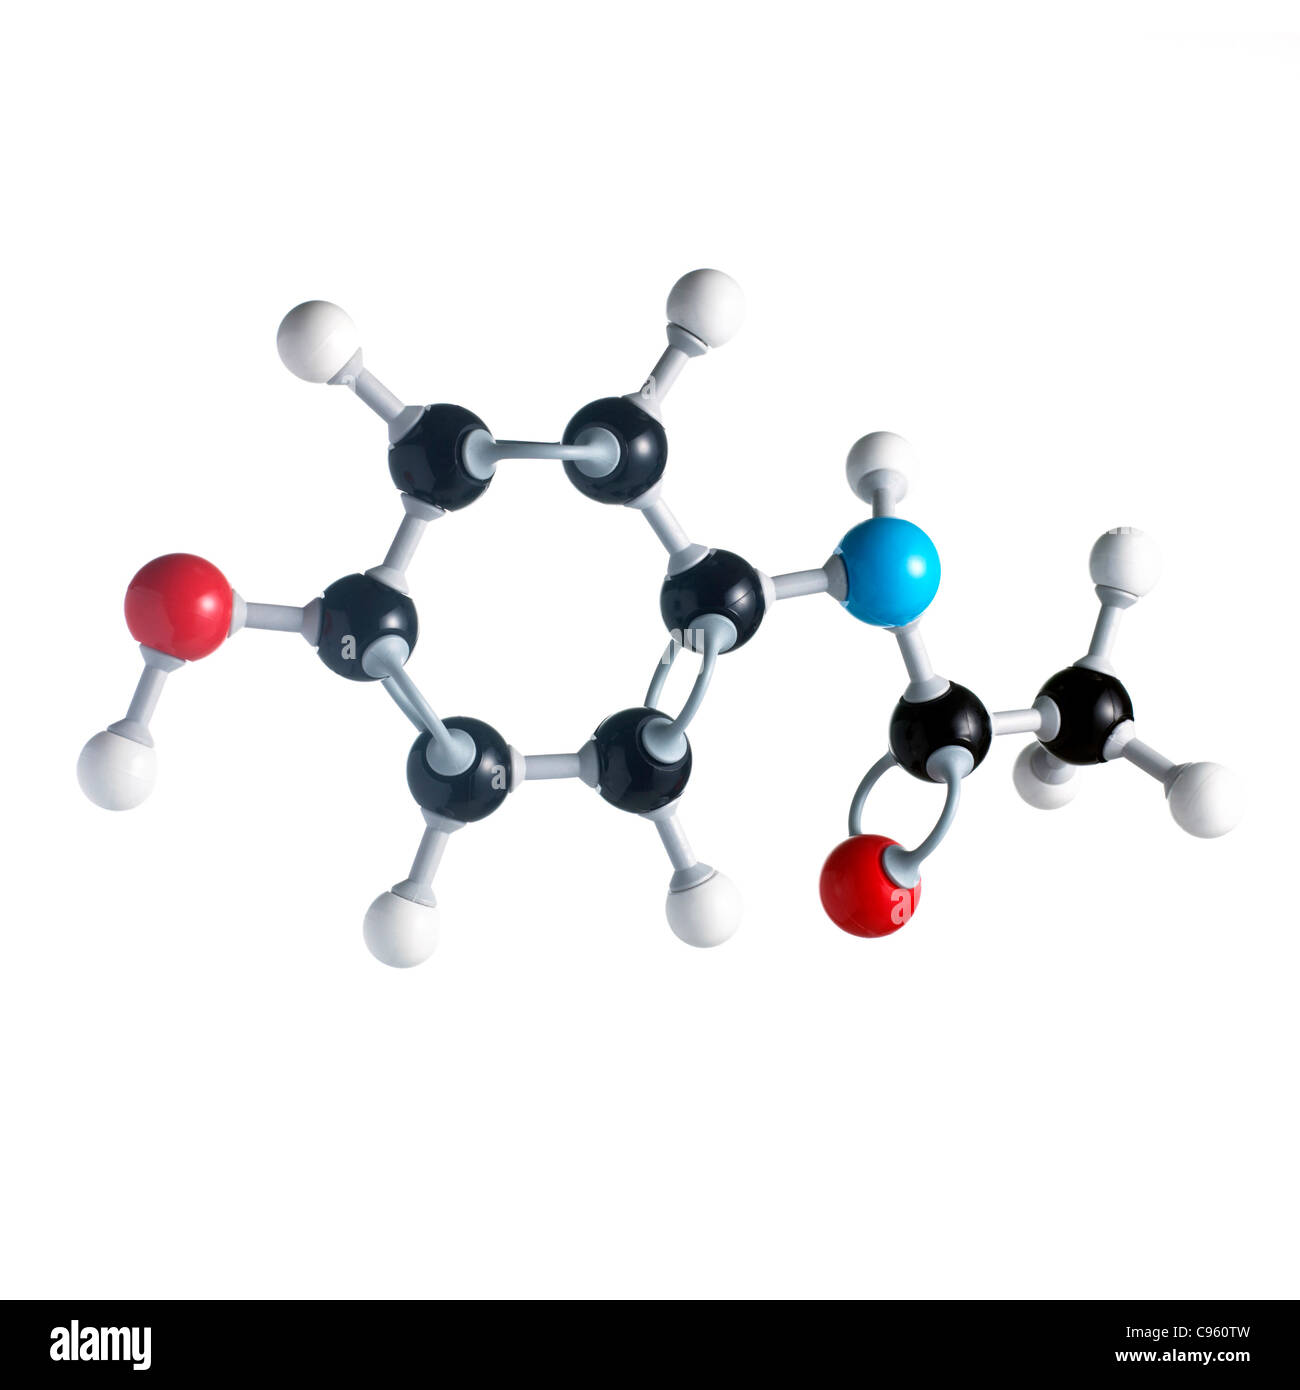 Paracetamol Molecule Structure Stock Illustration - Image: 52666299